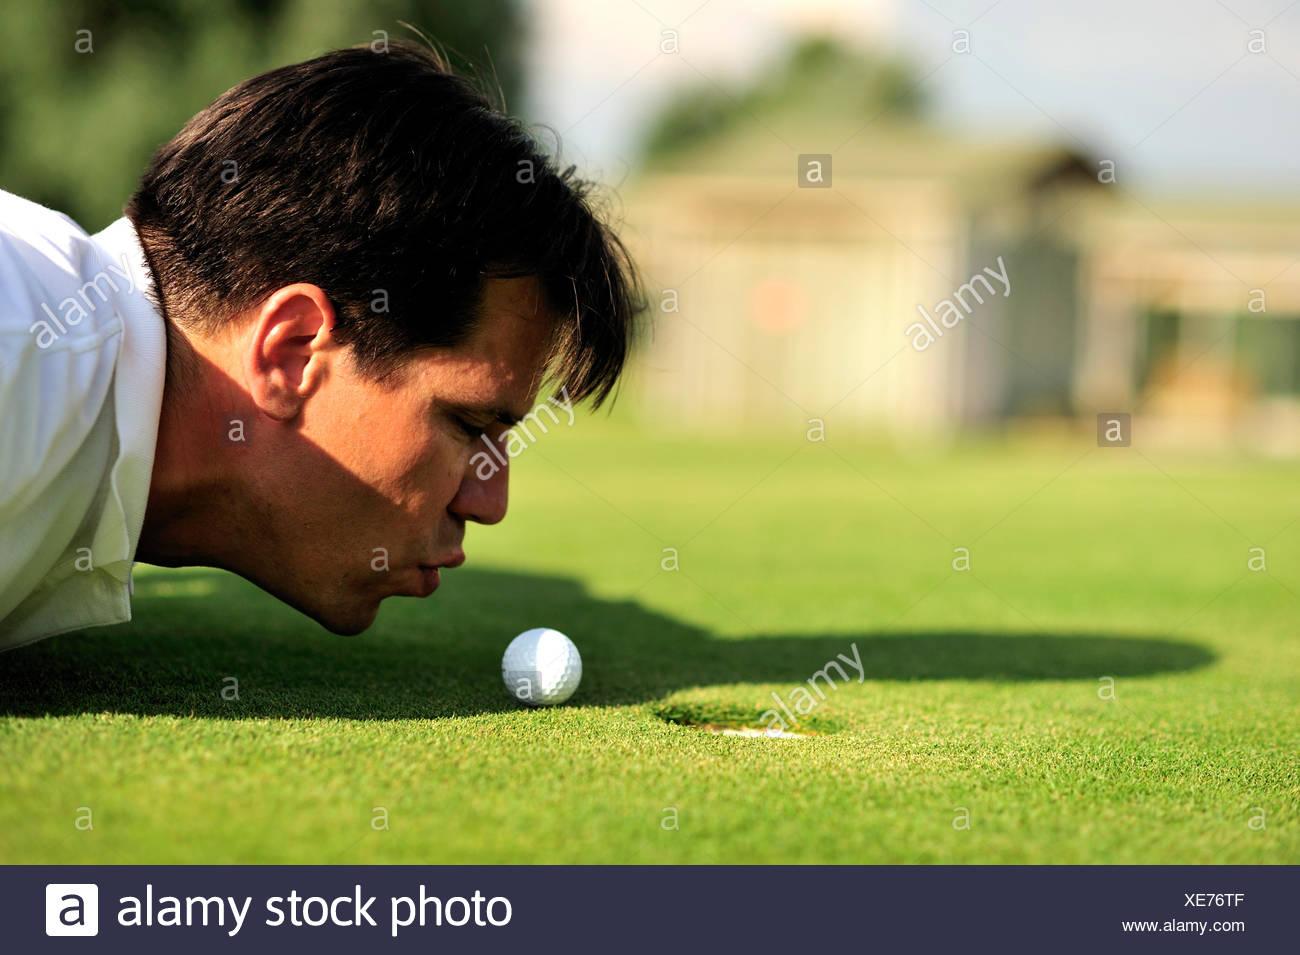 Golf cheater - Stock Image